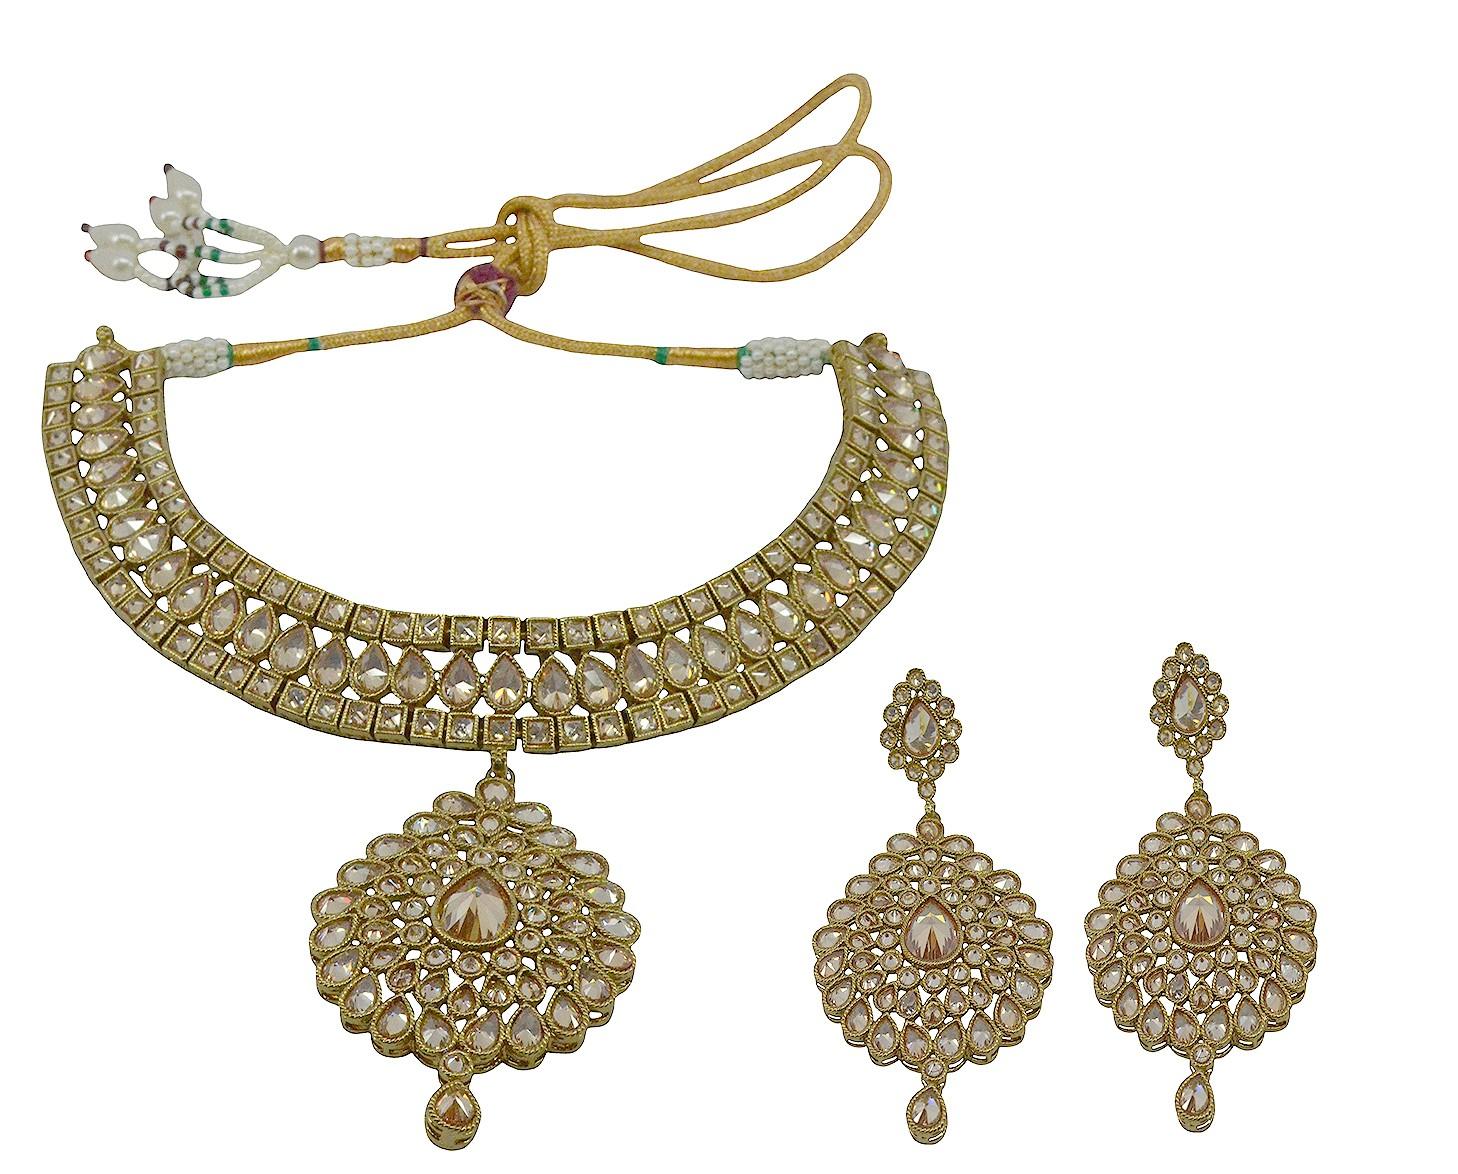 Saloni Fashion Jewellery Saloni Fashion Jewellery Saloni Fashion